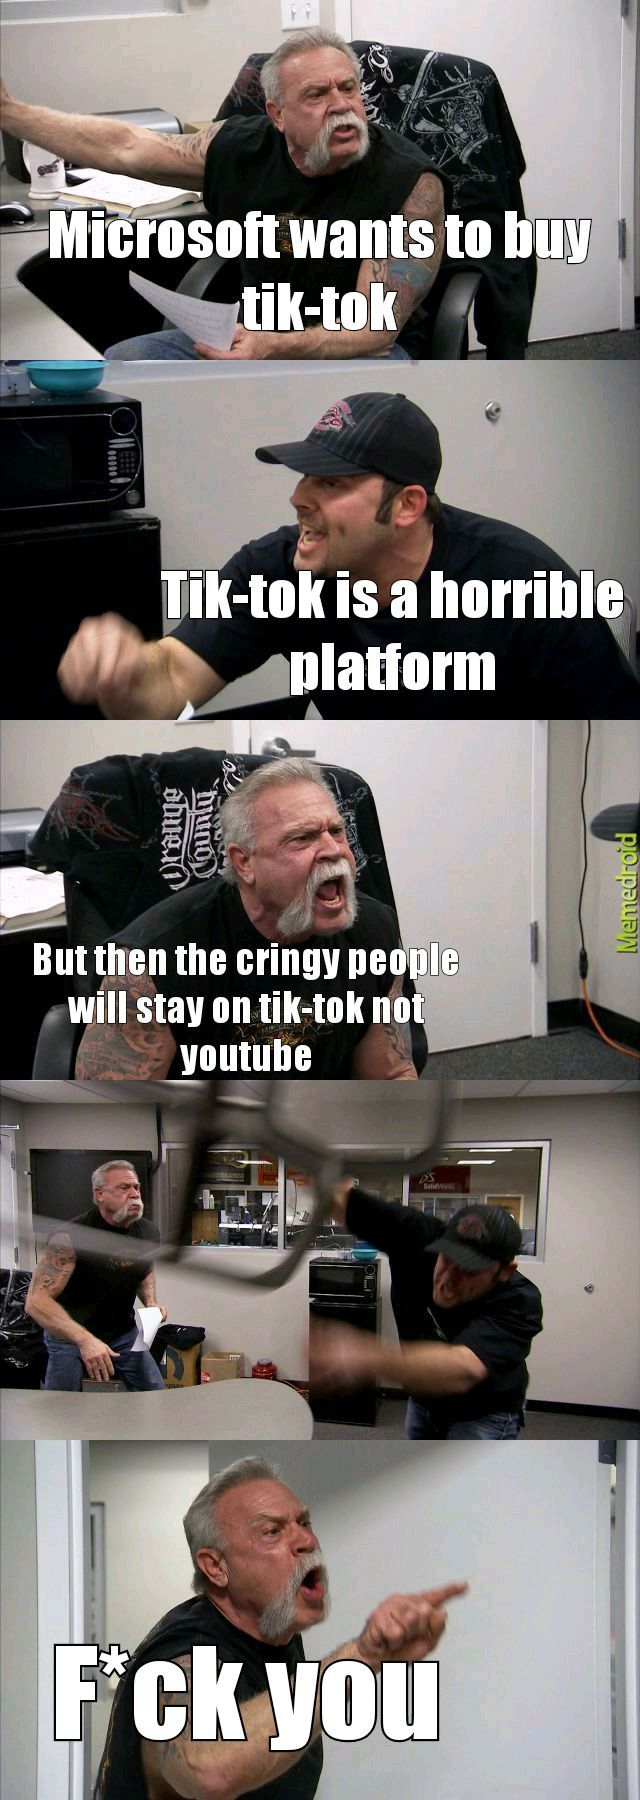 It's true though - meme